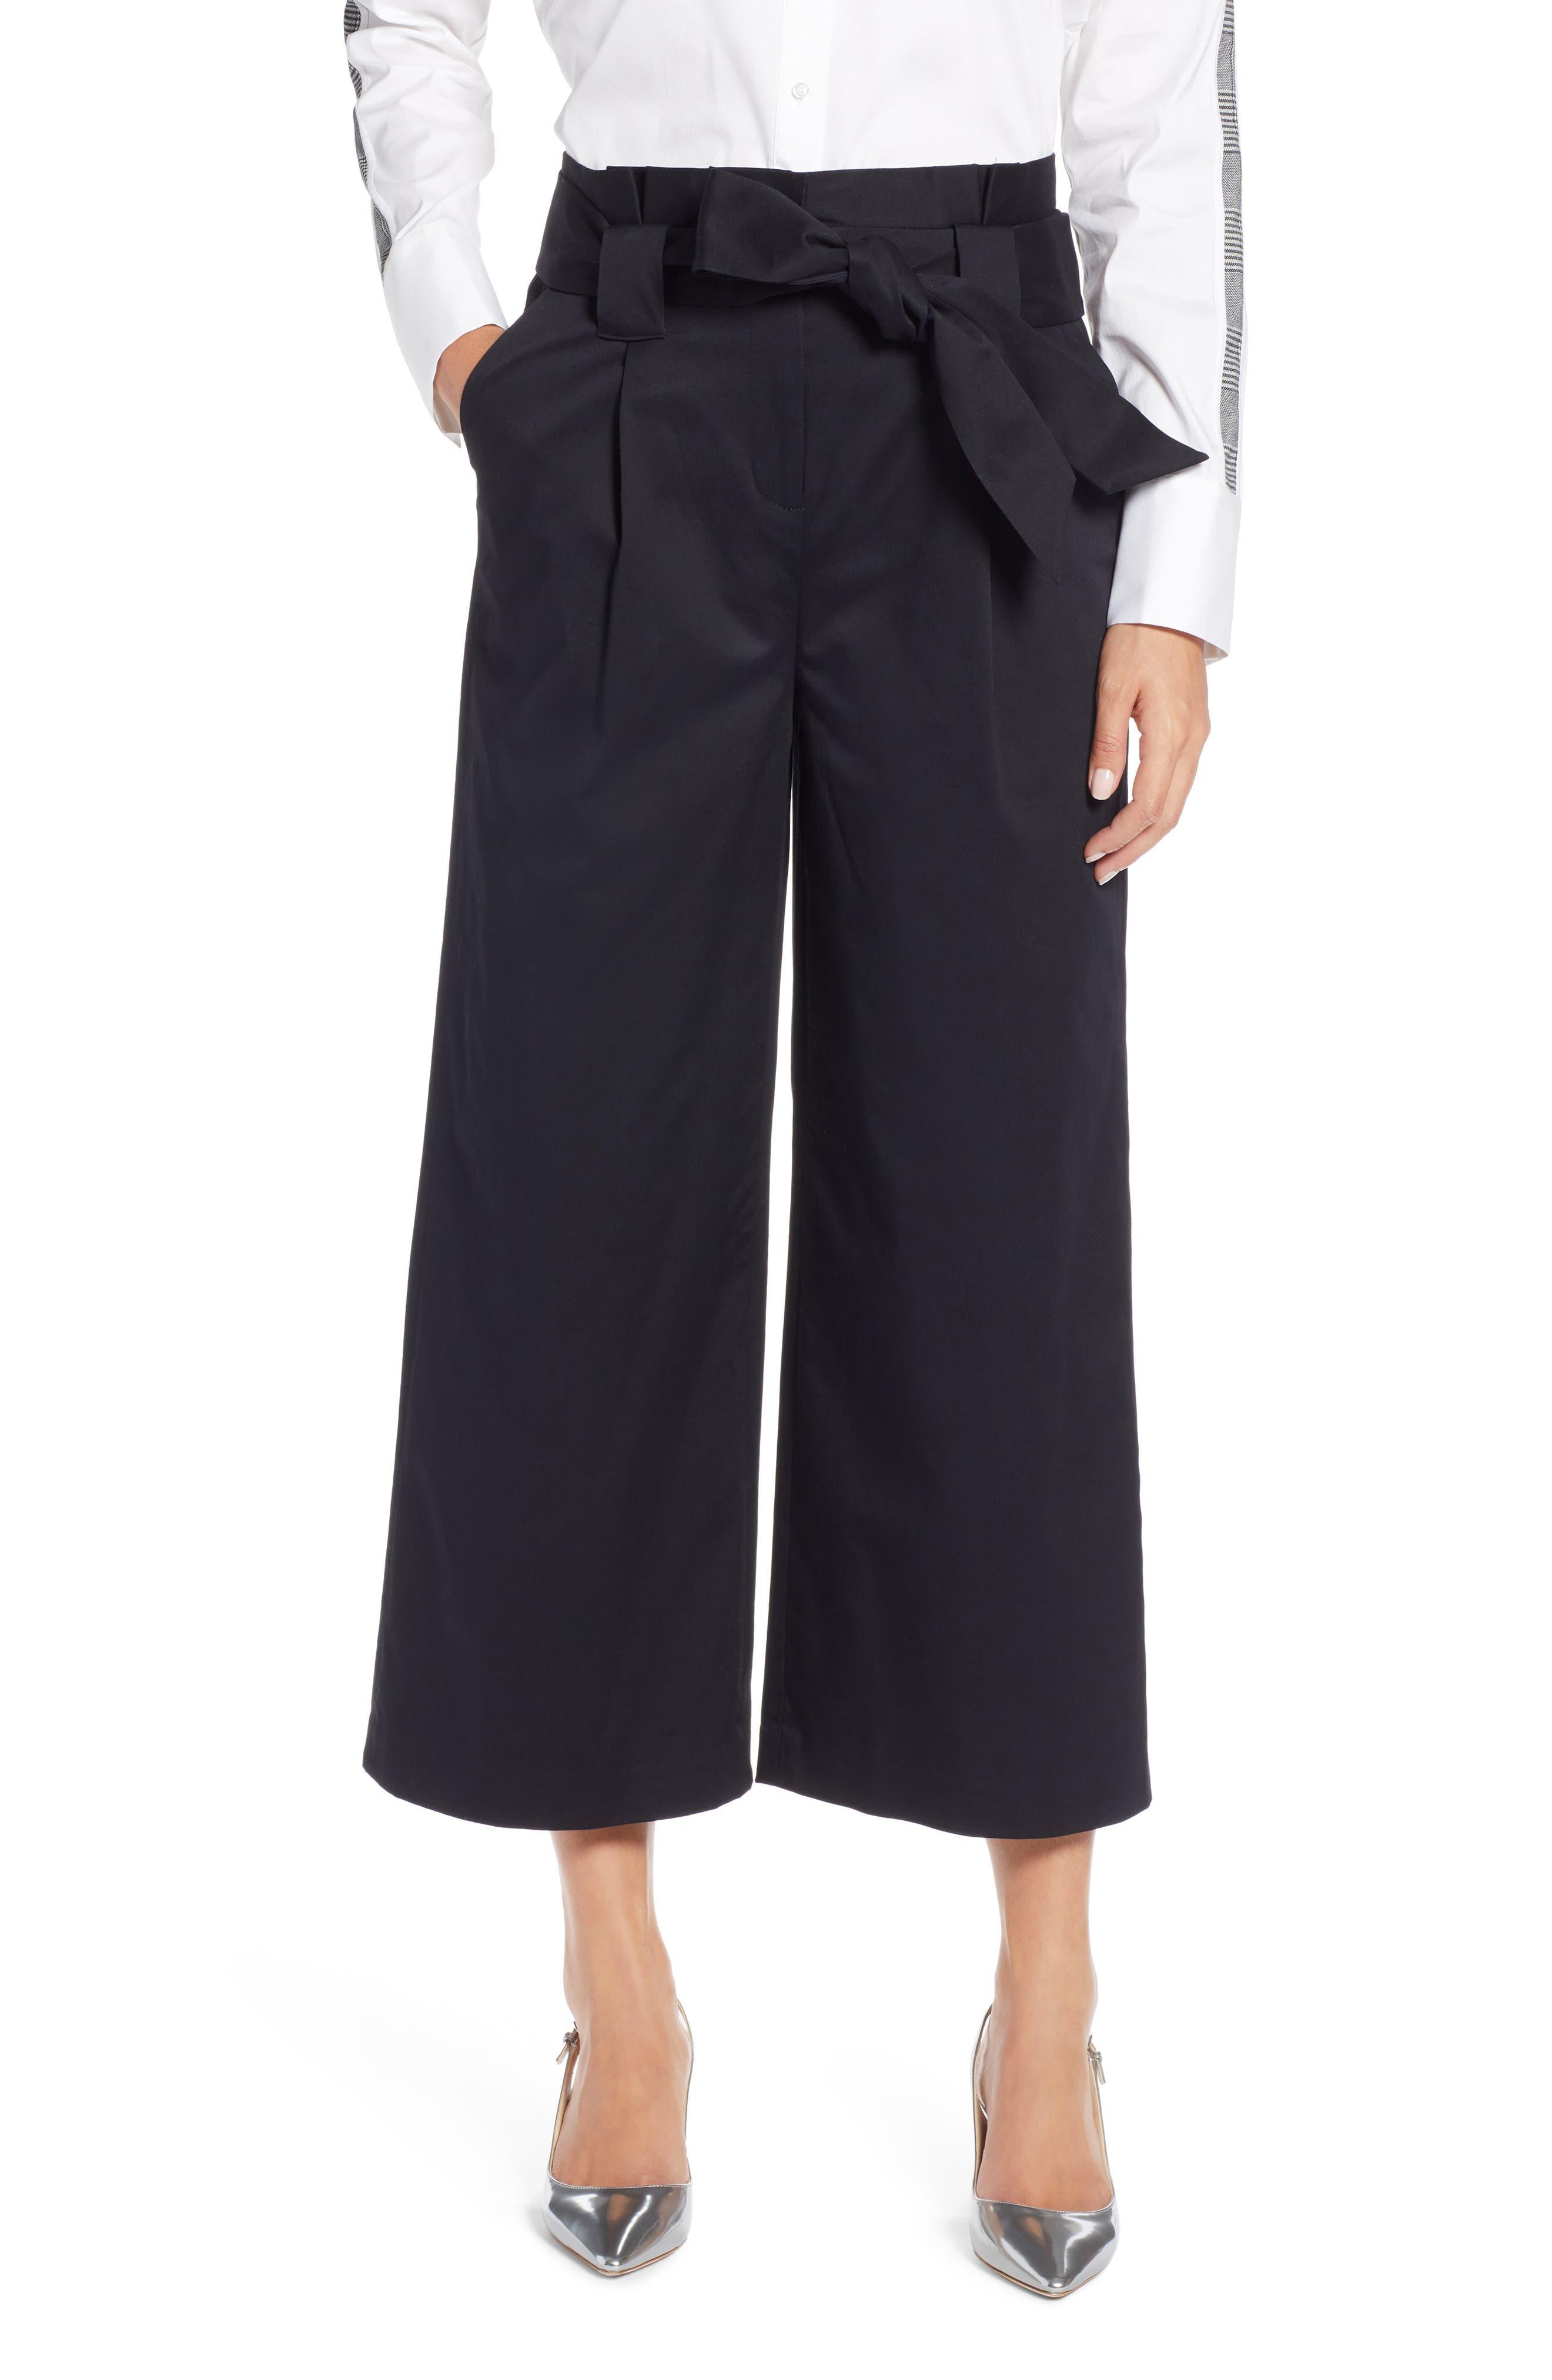 b111d01a6a6 Halogen Pants   Shorts for Women